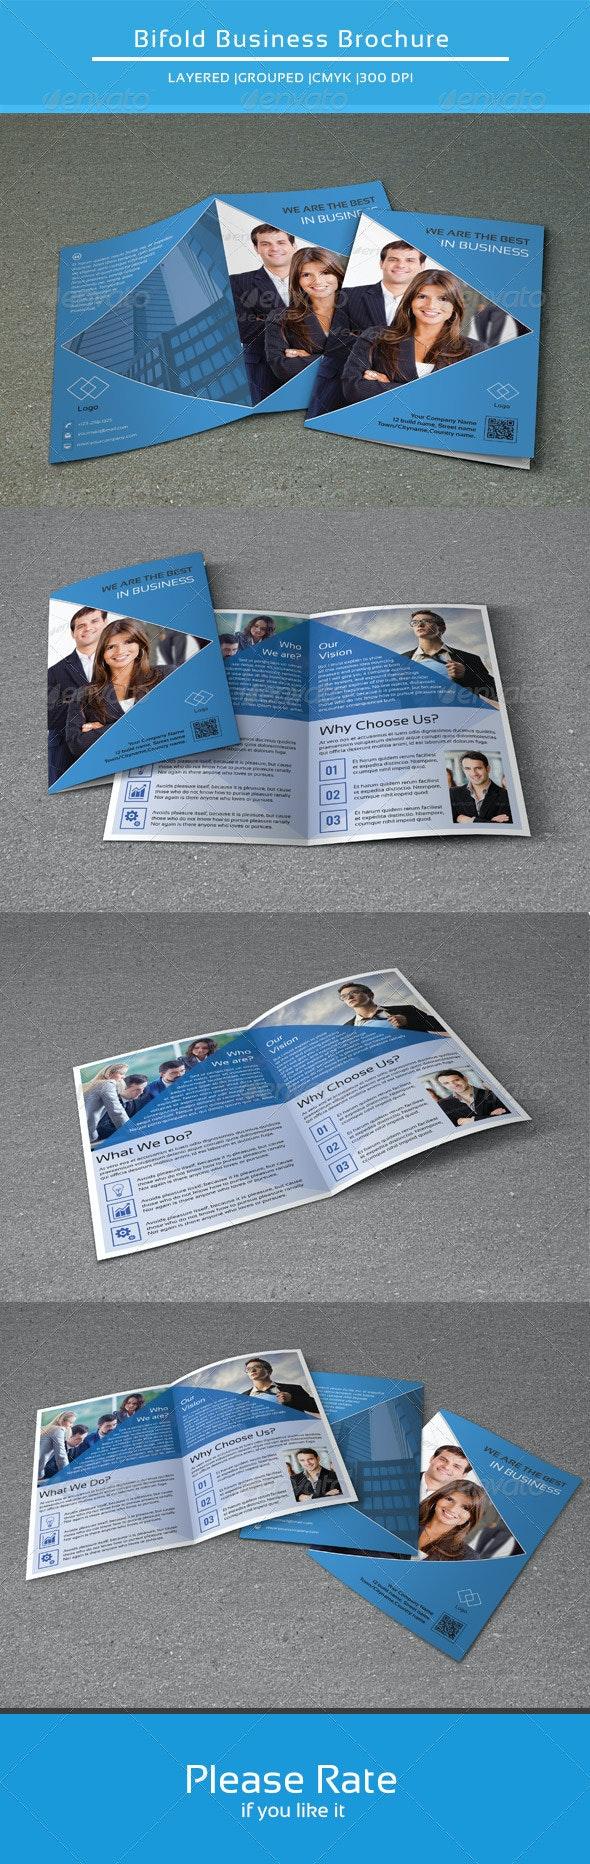 Bifold Business Brochure-V101 - Corporate Brochures